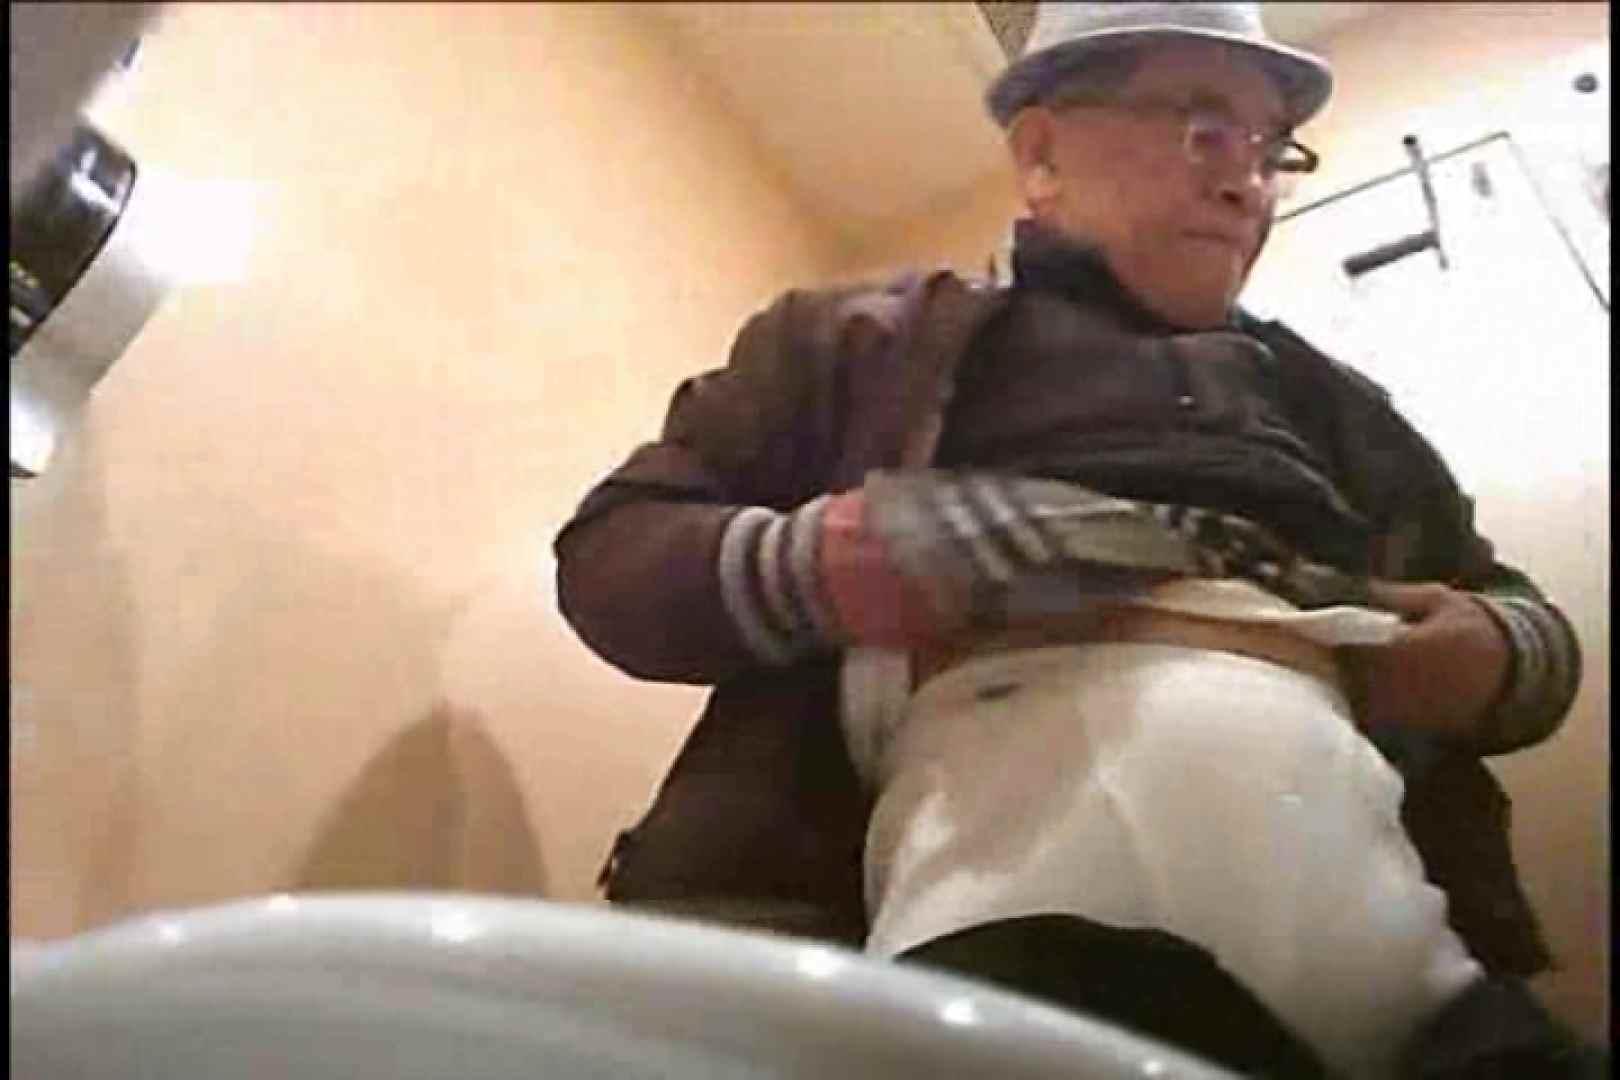 Gボーイ初投稿!掴み取りさんの洗面所覗き!in新幹線!VOL.11 覗きシーン ゲイアダルト画像 101枚 47